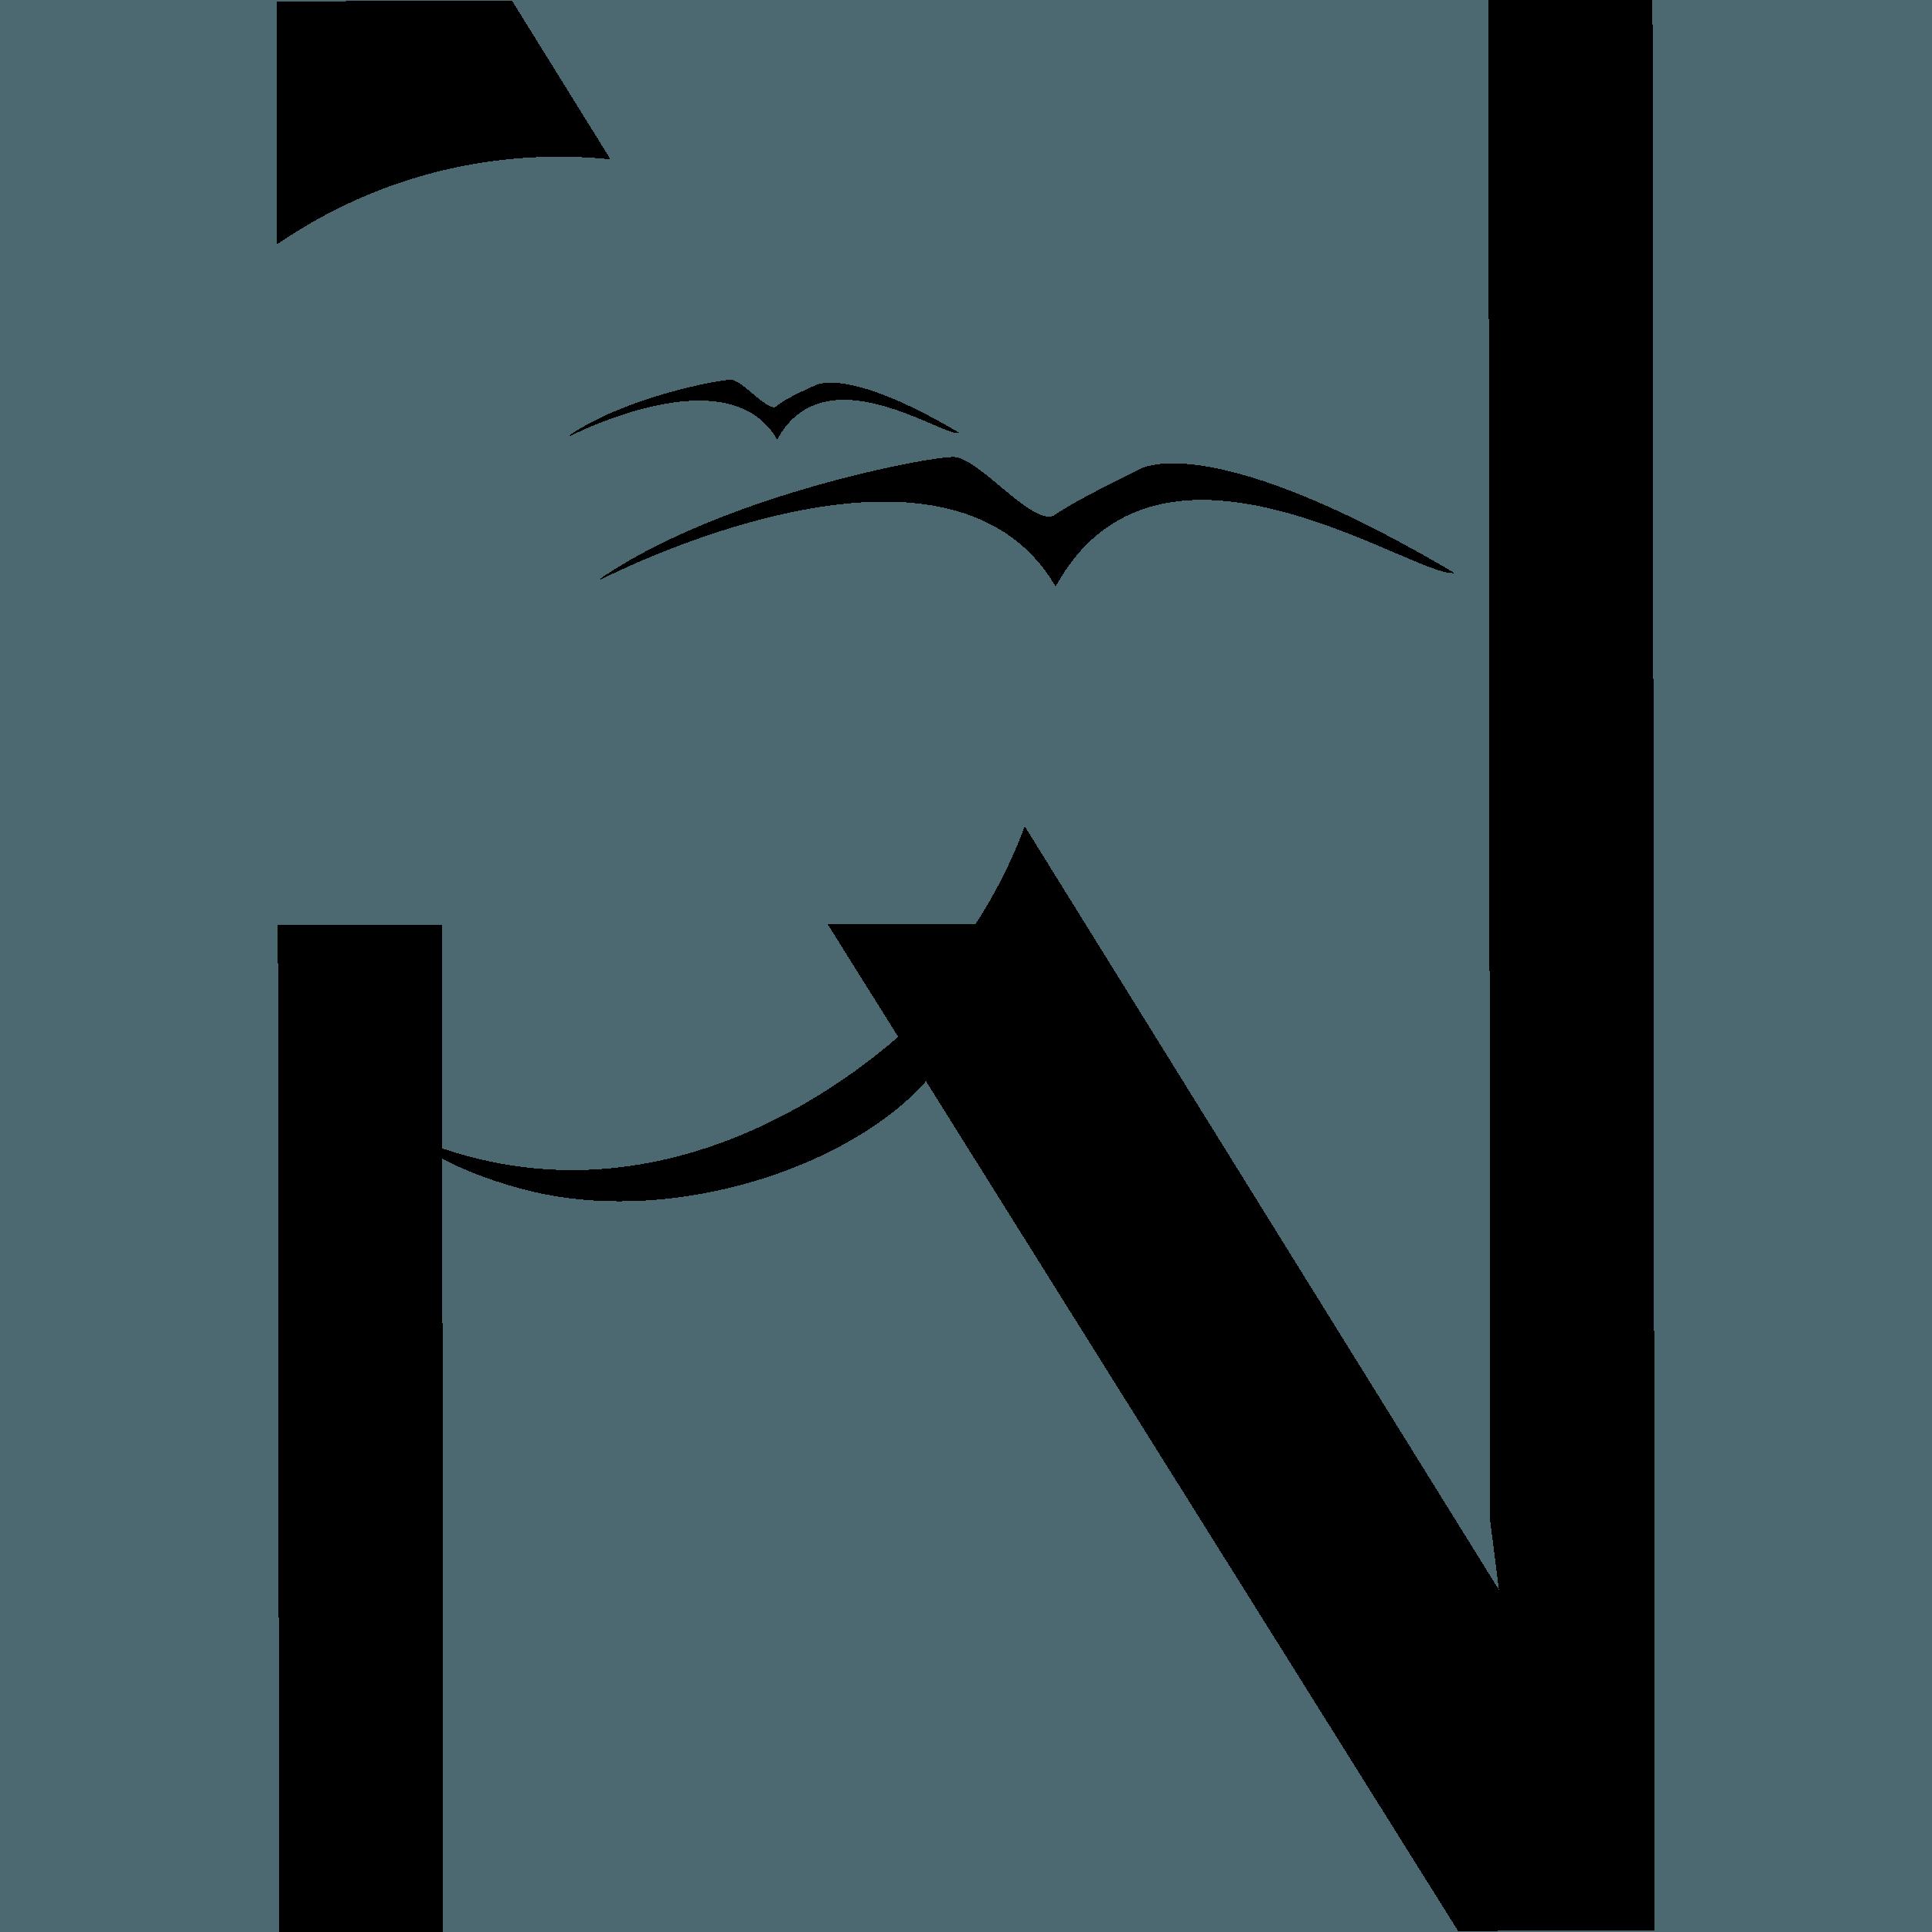 Newrizons Federal Credit Union Emblem